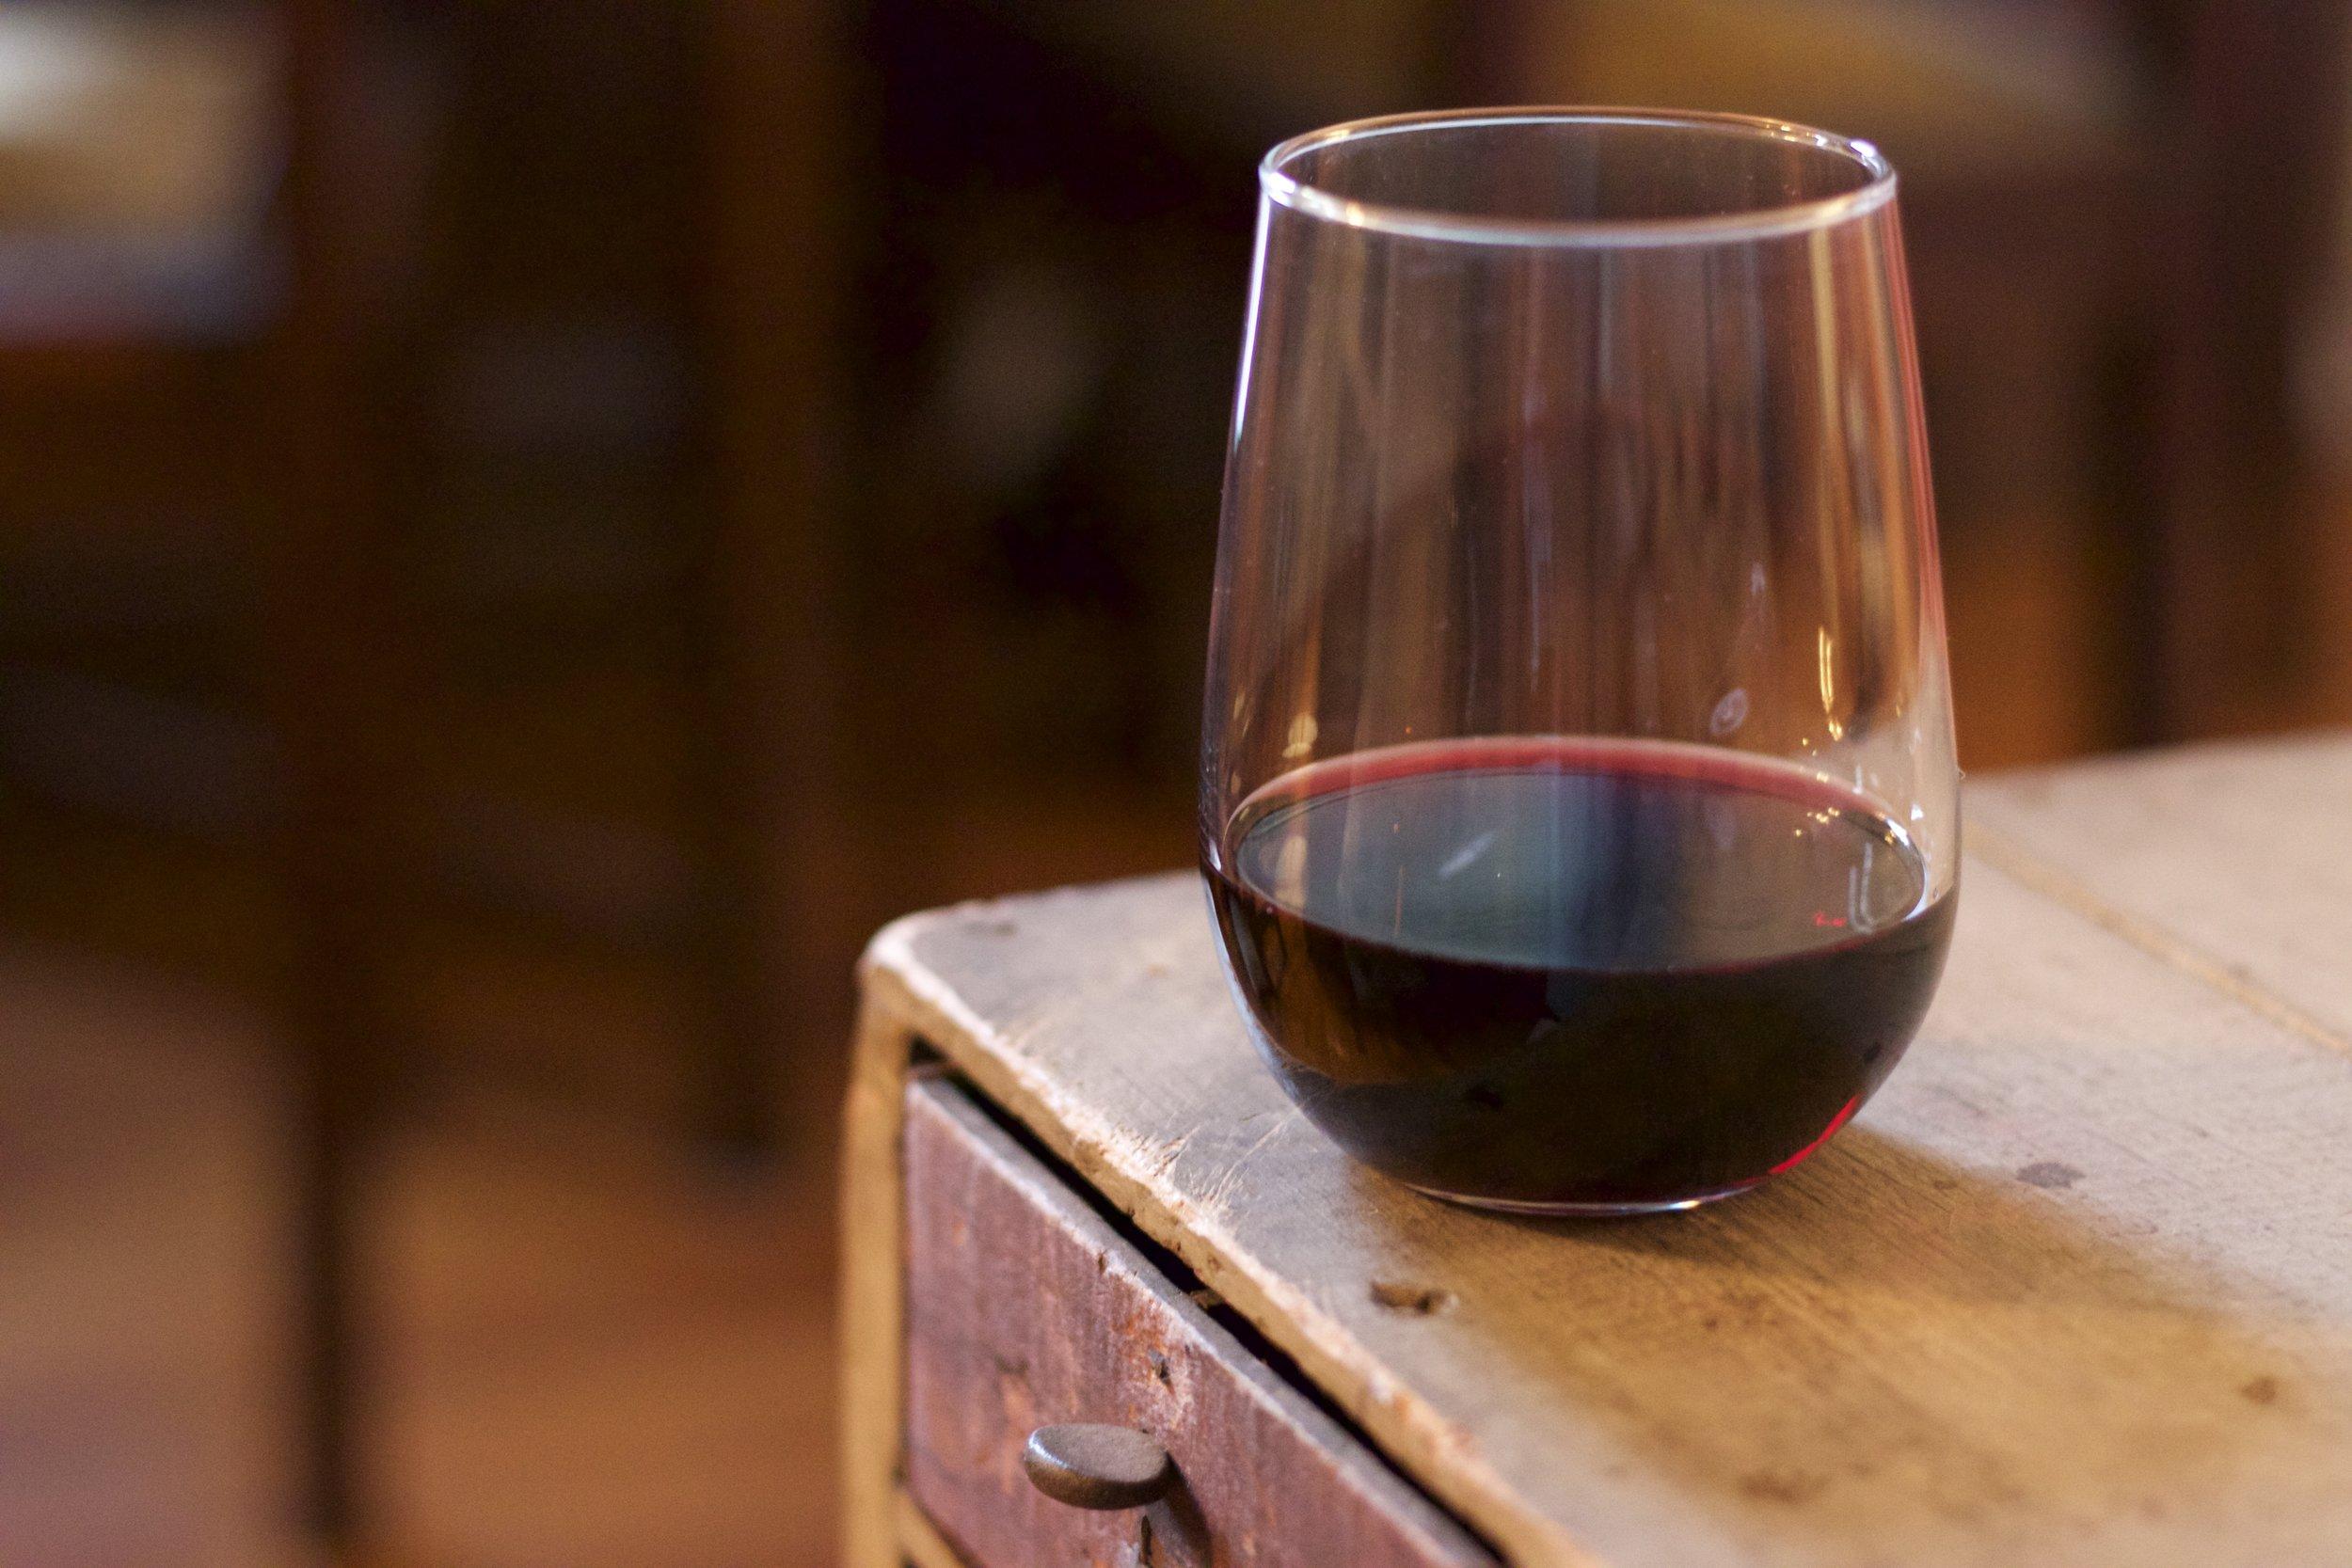 bogle essential red 2014 trader joe's best wine review